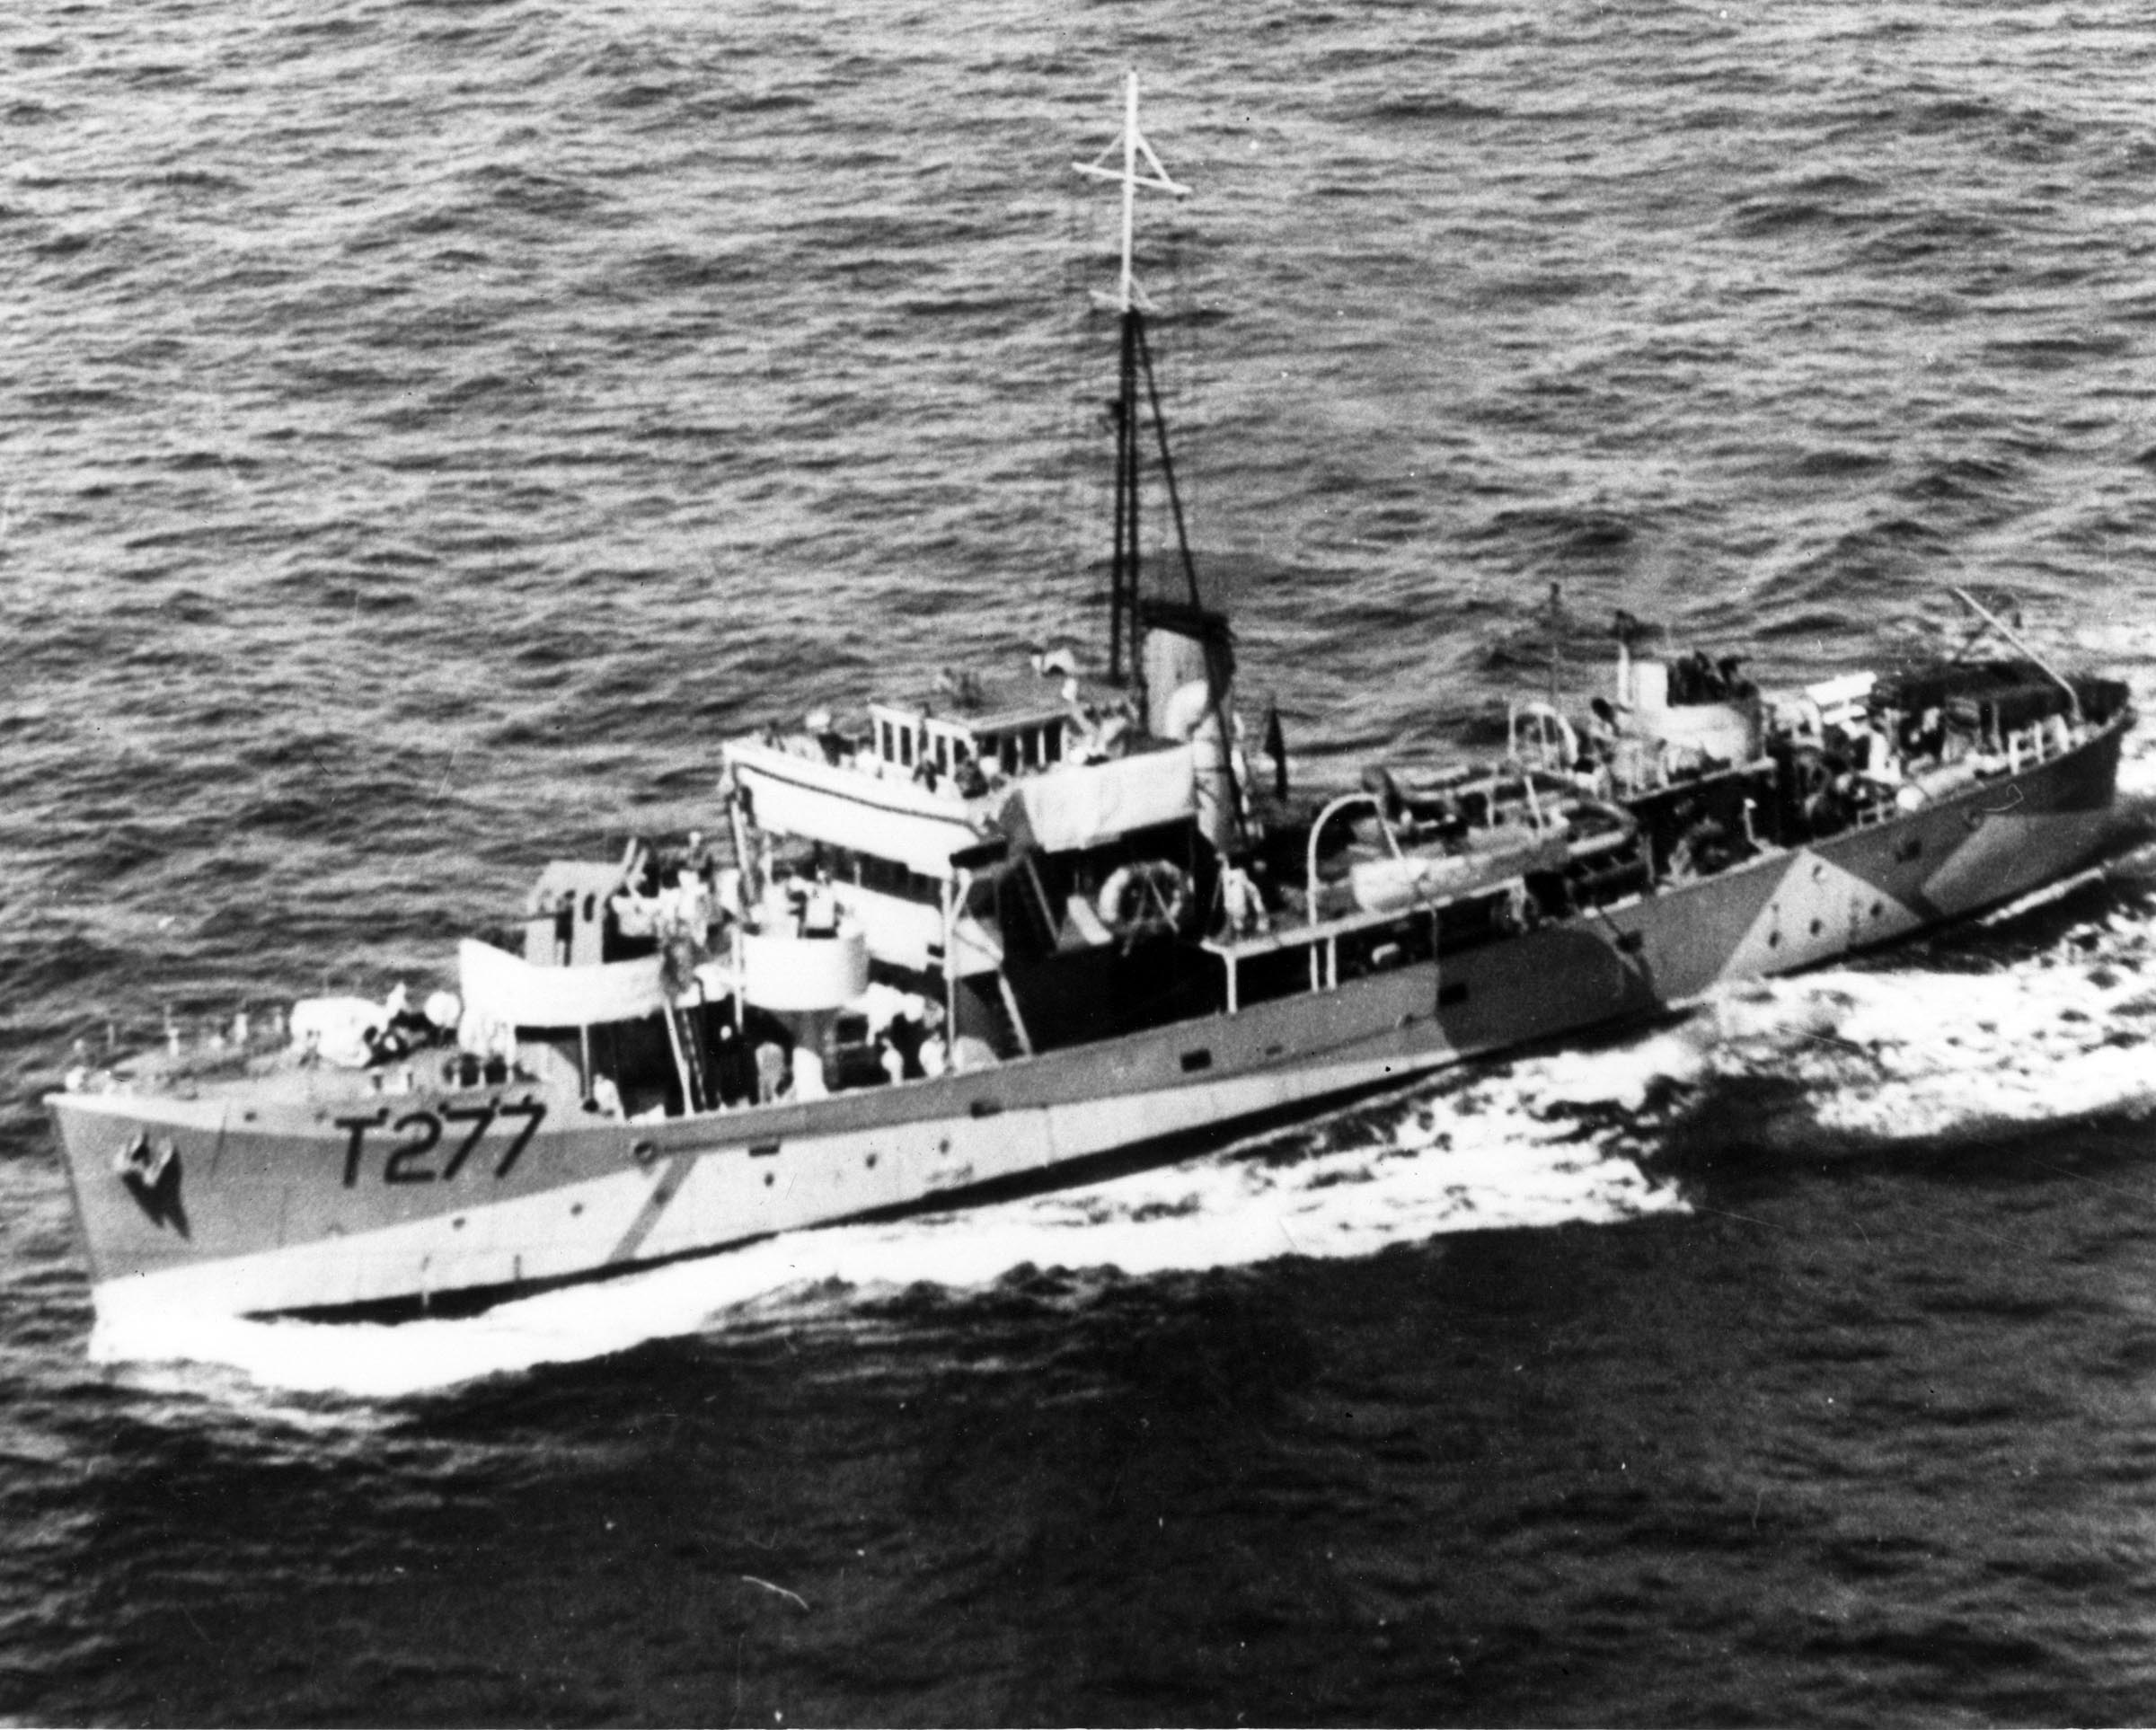 HMCS MISCOU